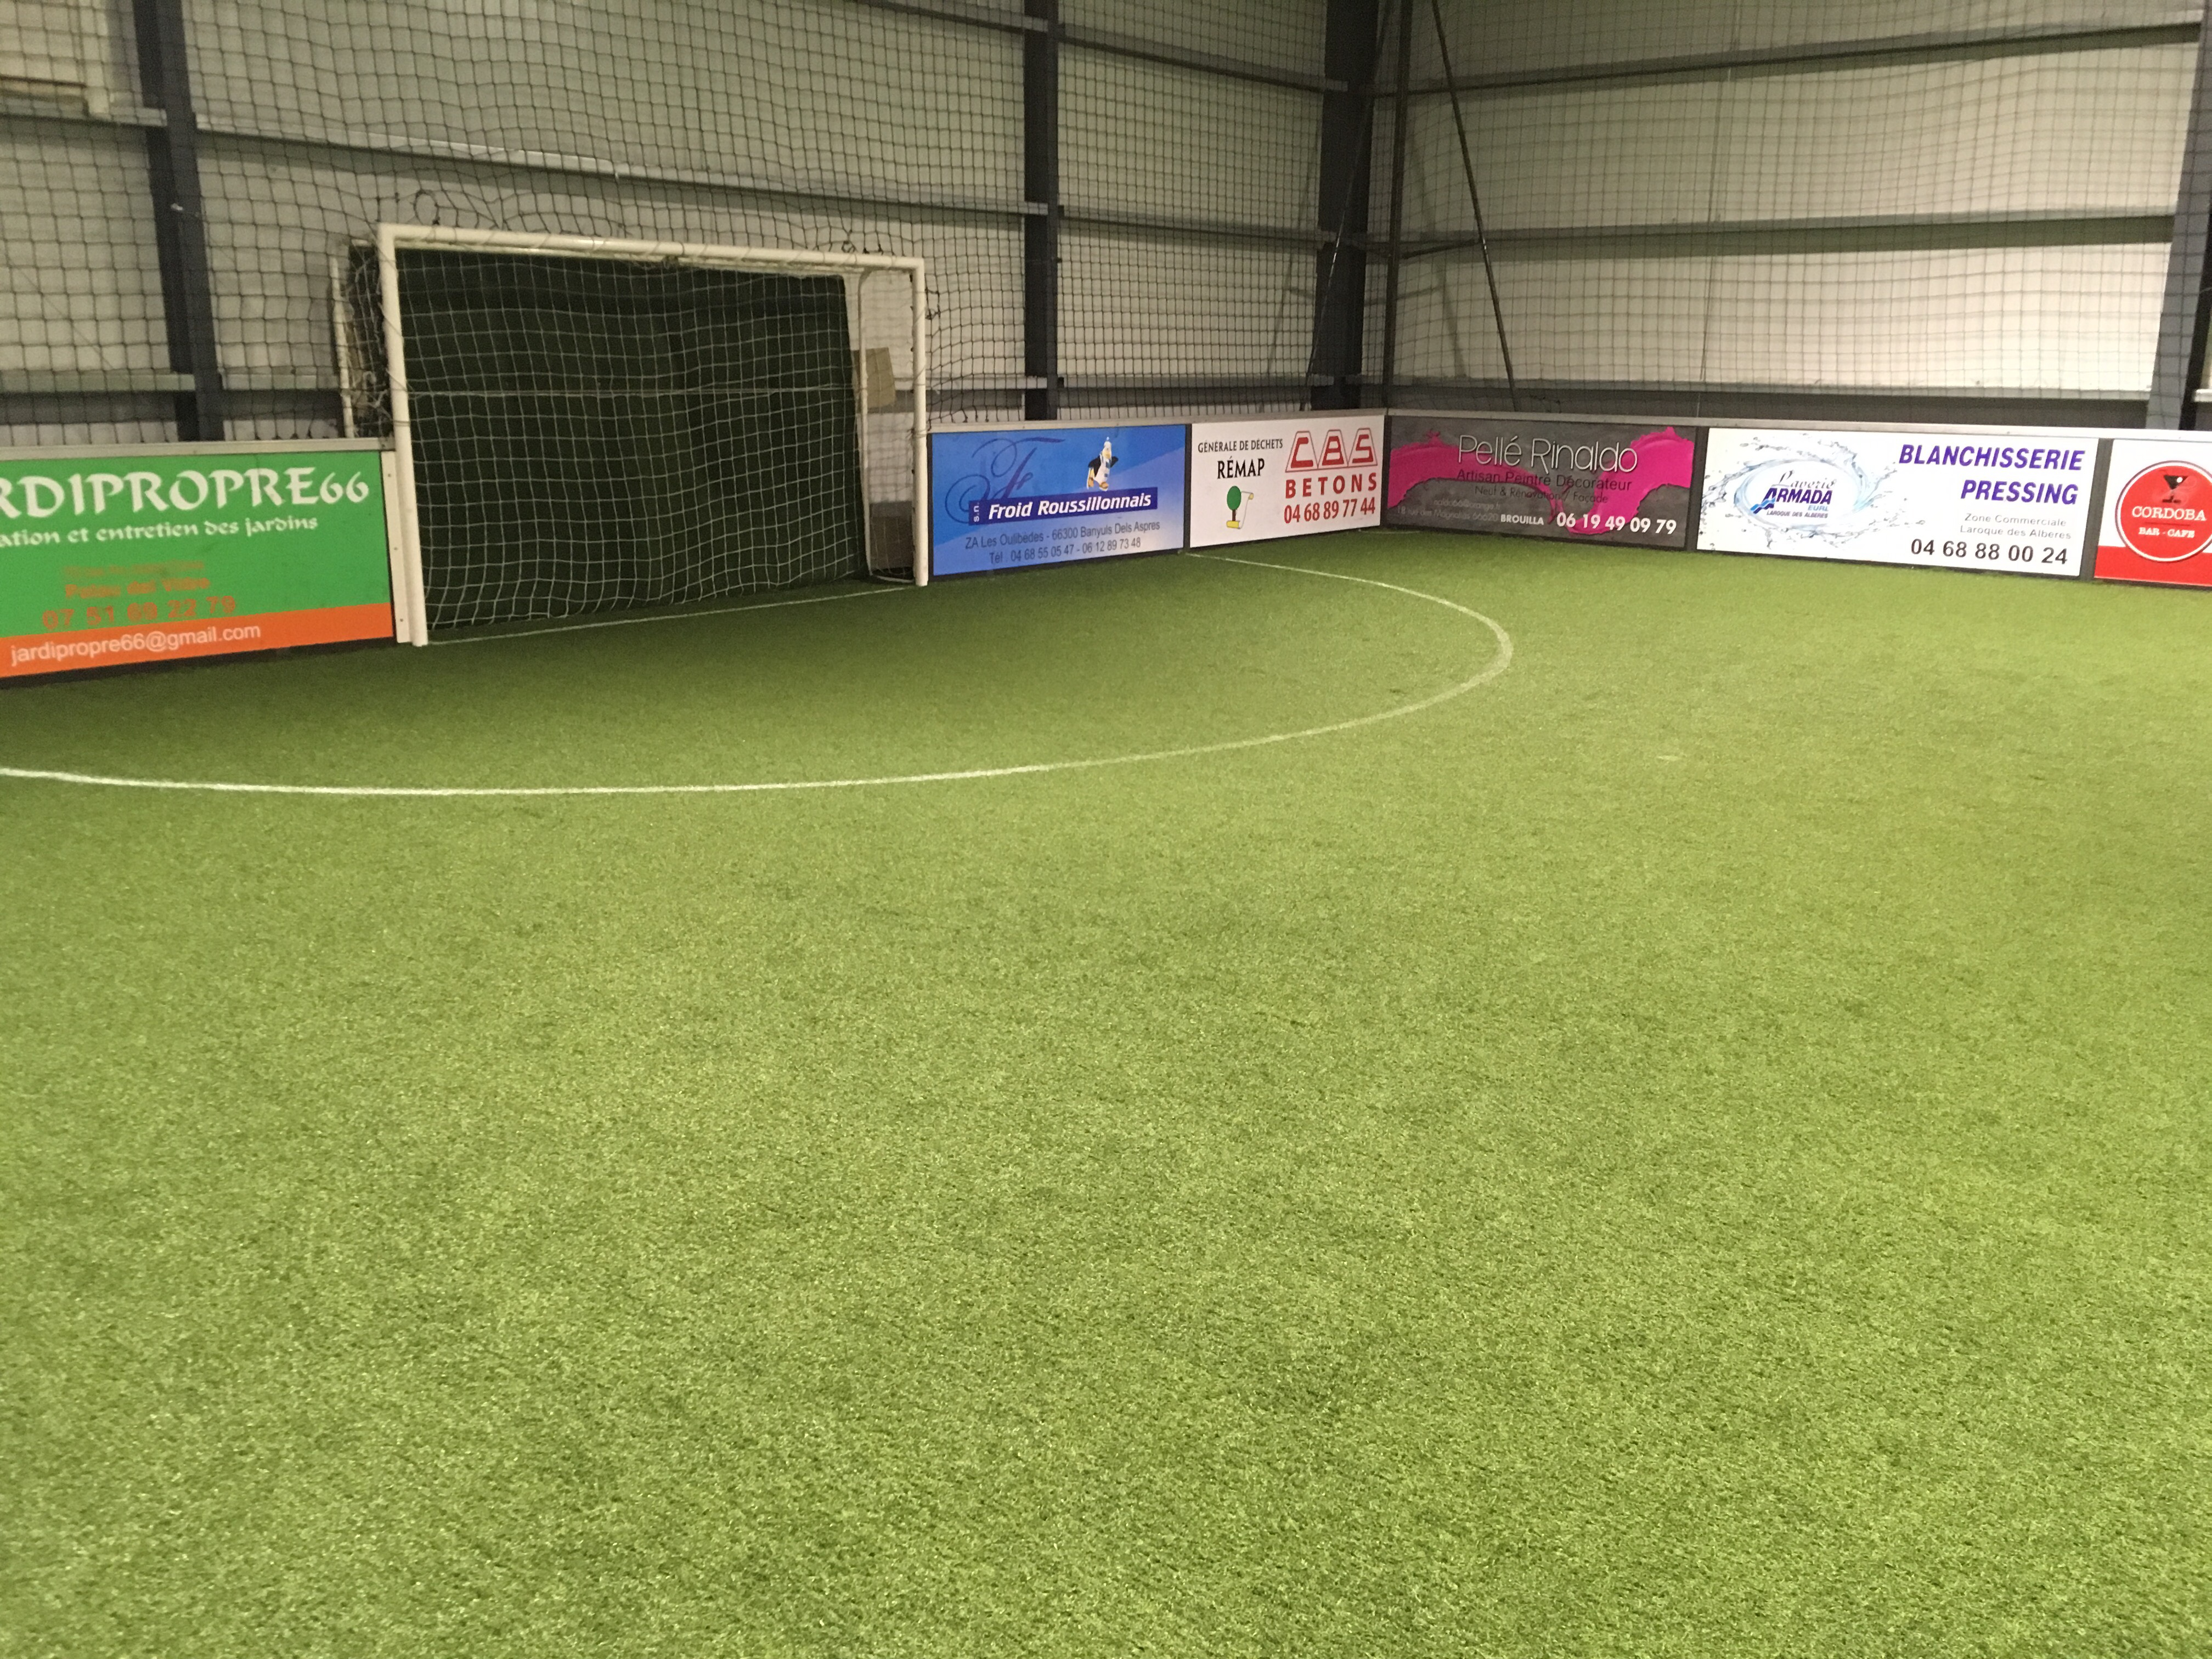 Futsal Dels Monts Foot En Salle Dans Les Pyrenees Orientales 66